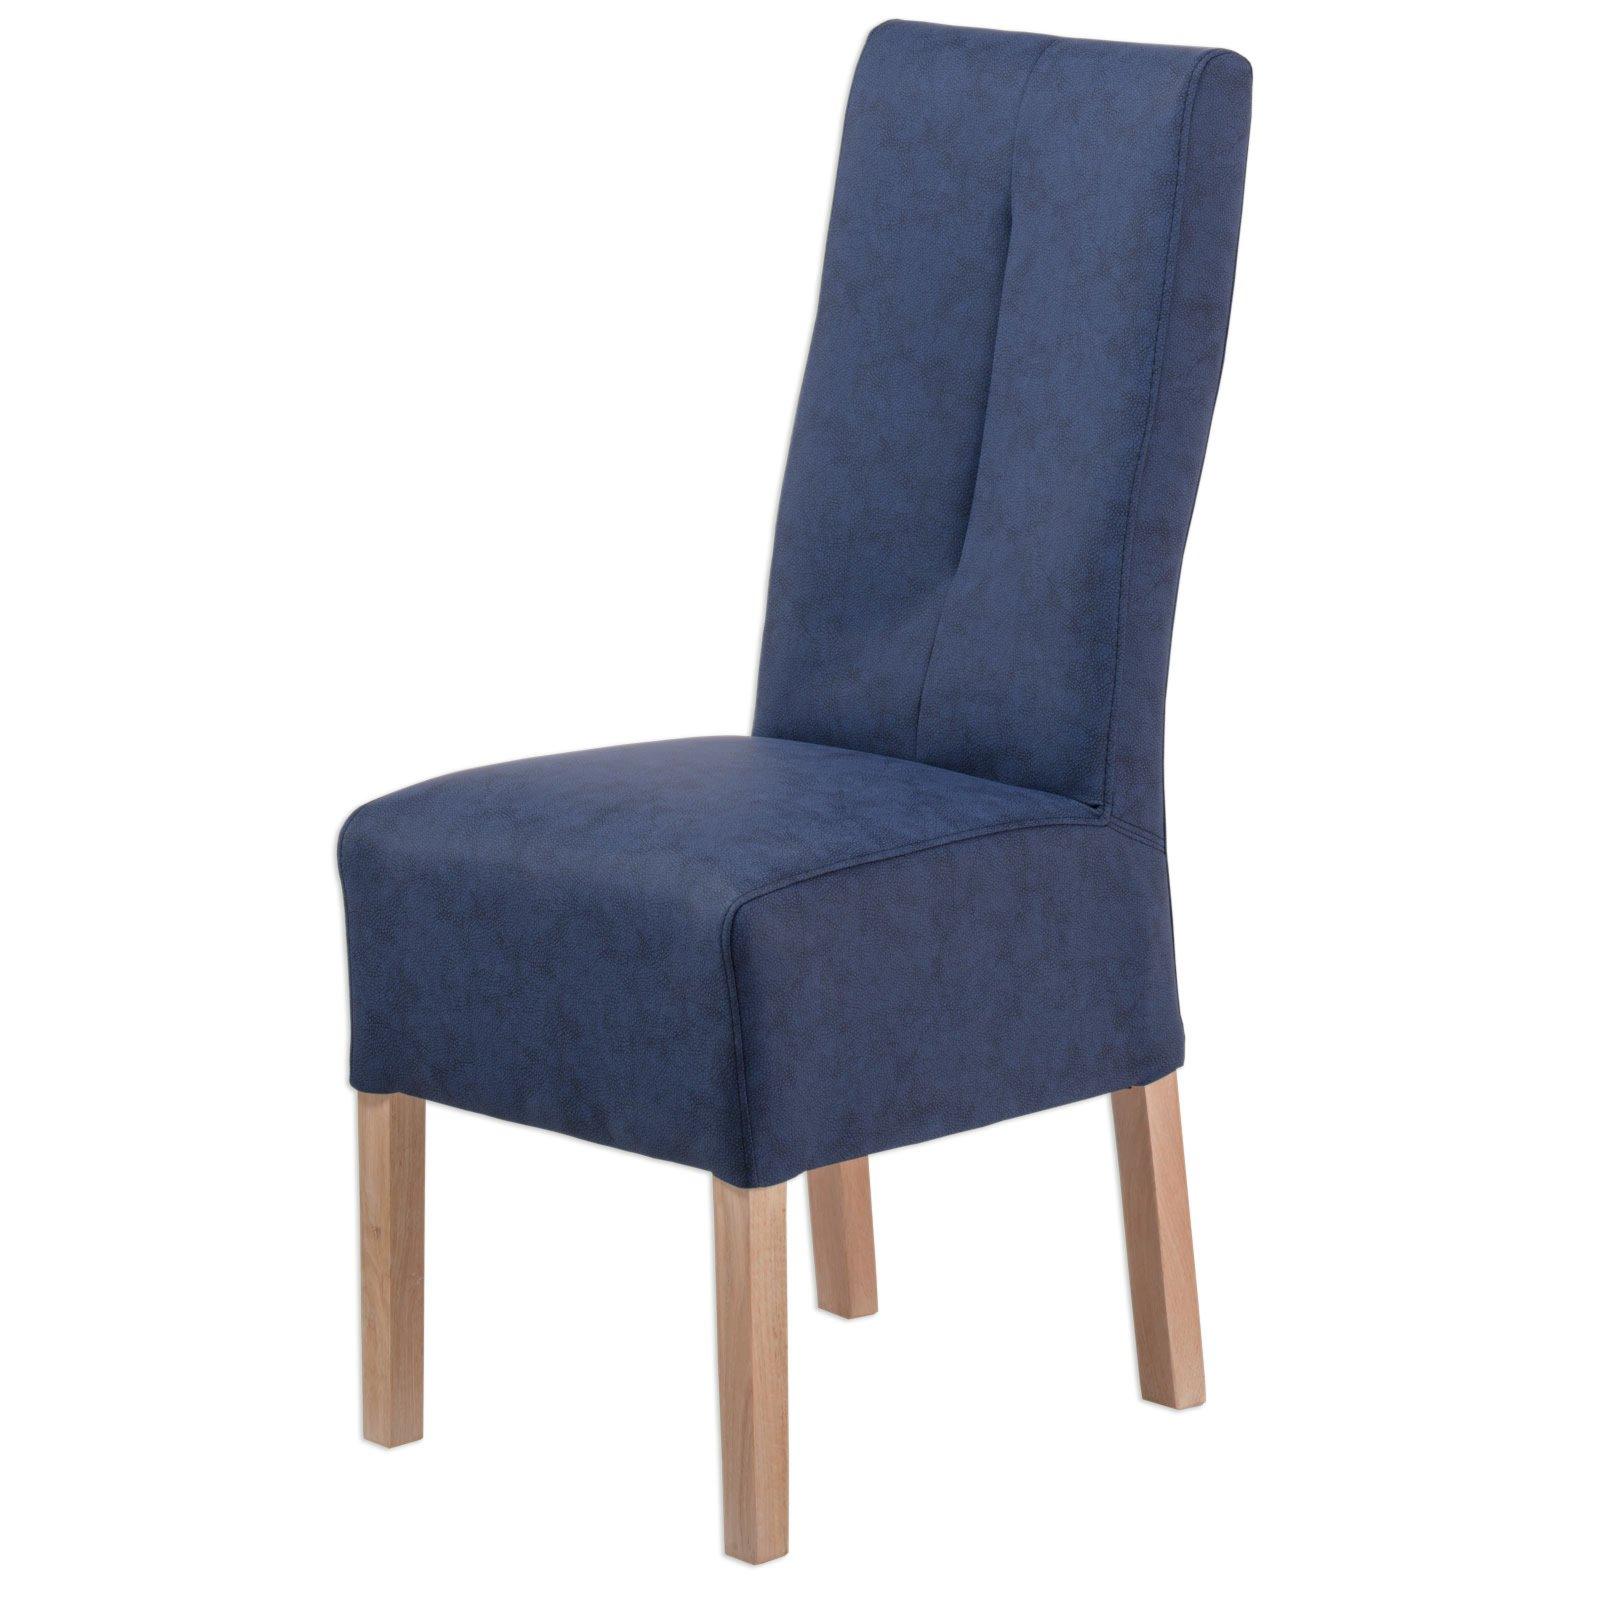 polsterstuhl fabius nachtblau eiche massivholz. Black Bedroom Furniture Sets. Home Design Ideas